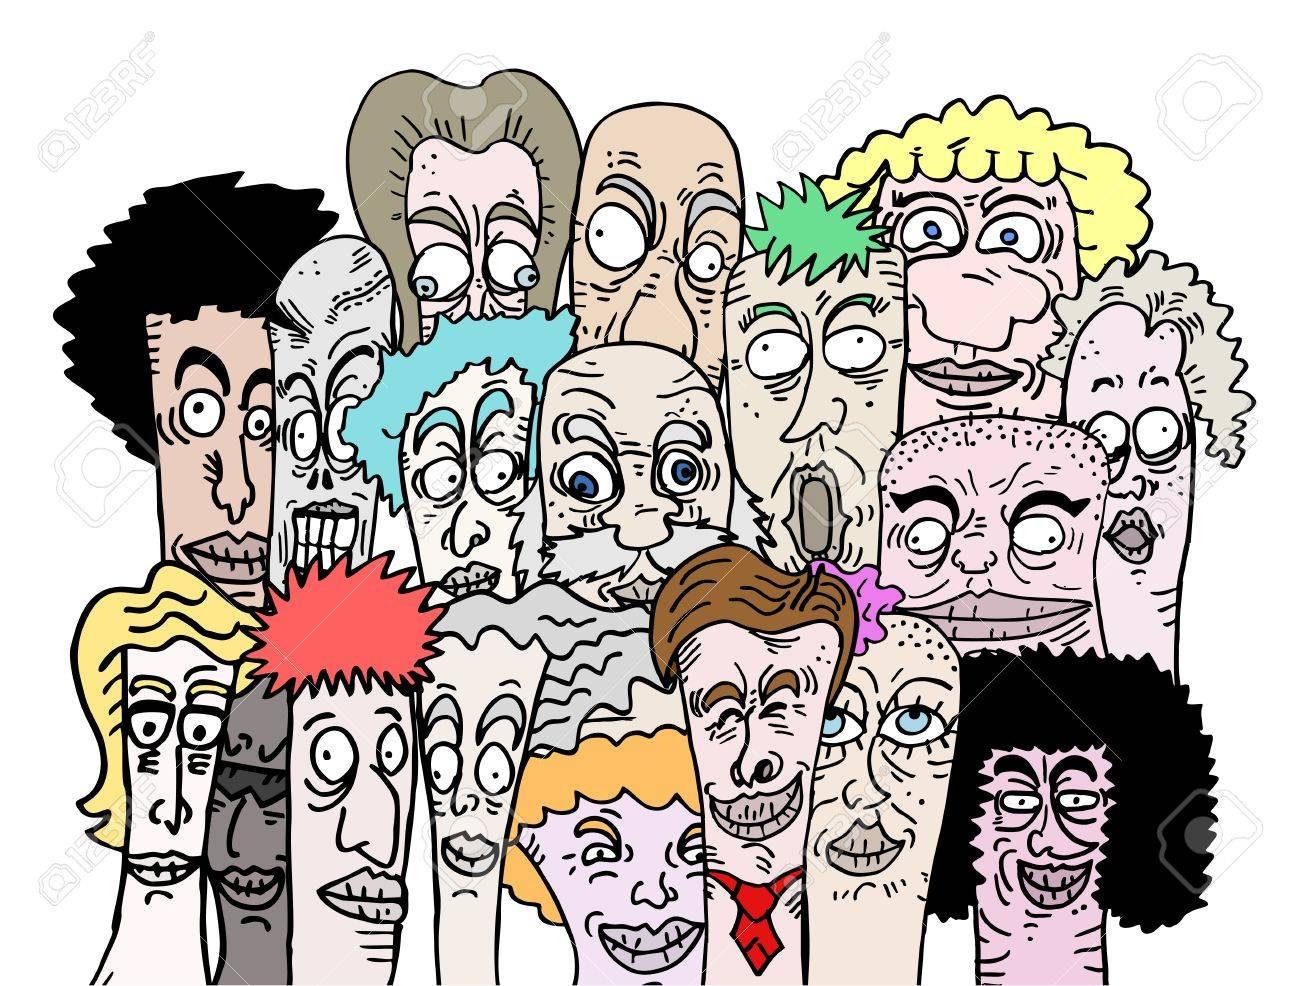 Color cartoon art friends - 14996866